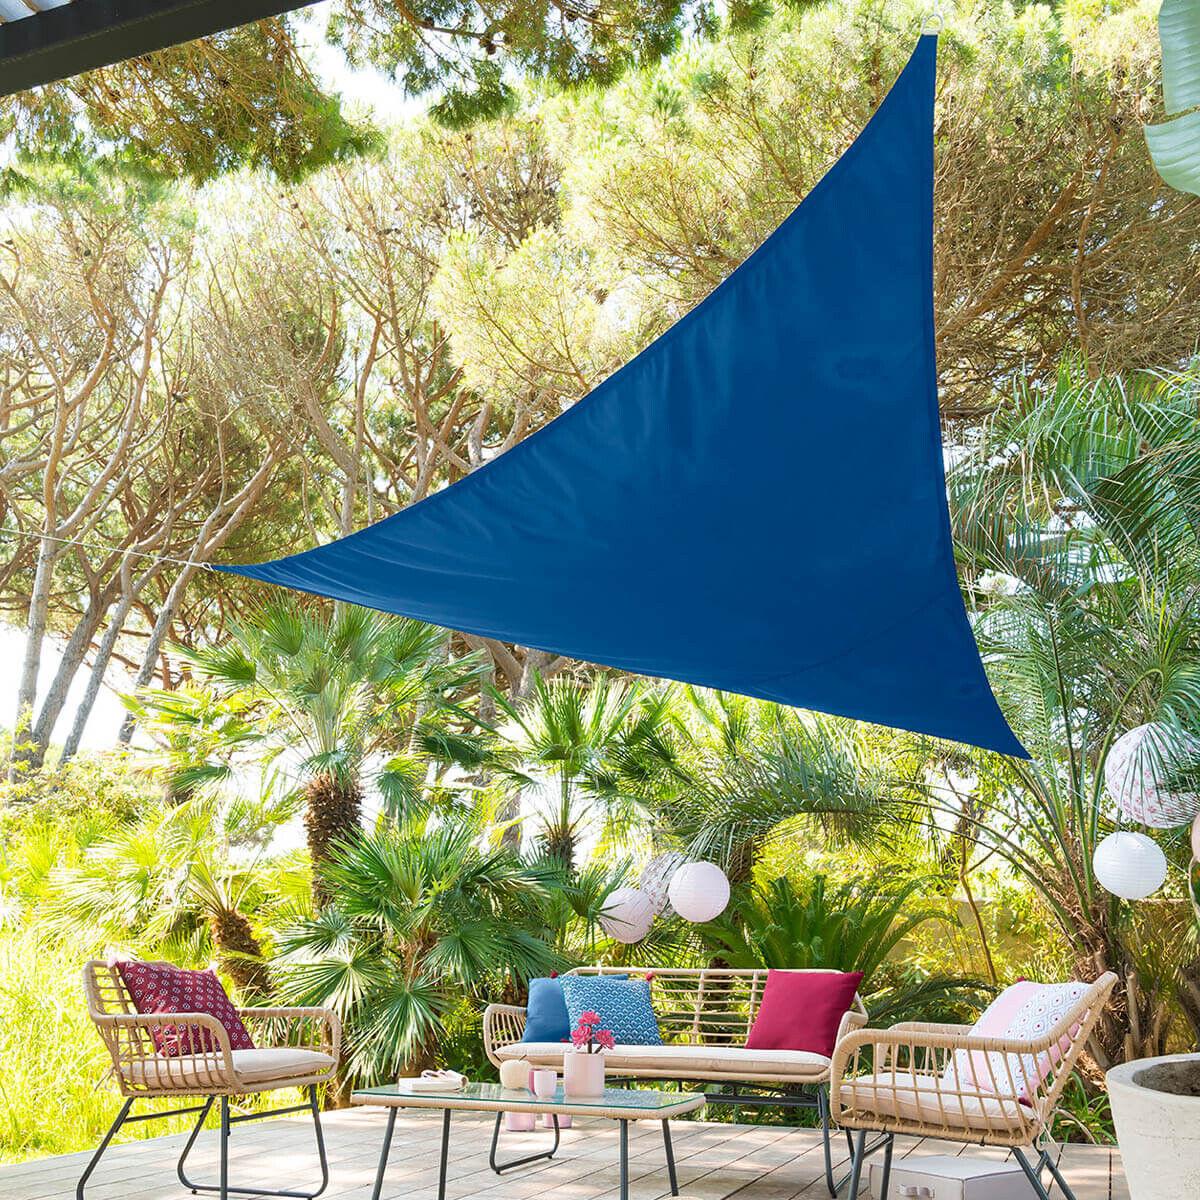 Hespéride Voile d'ombrage Curacao triangulaire Bleu indigo Jardin 3 x 3 x 3 m - Polyester